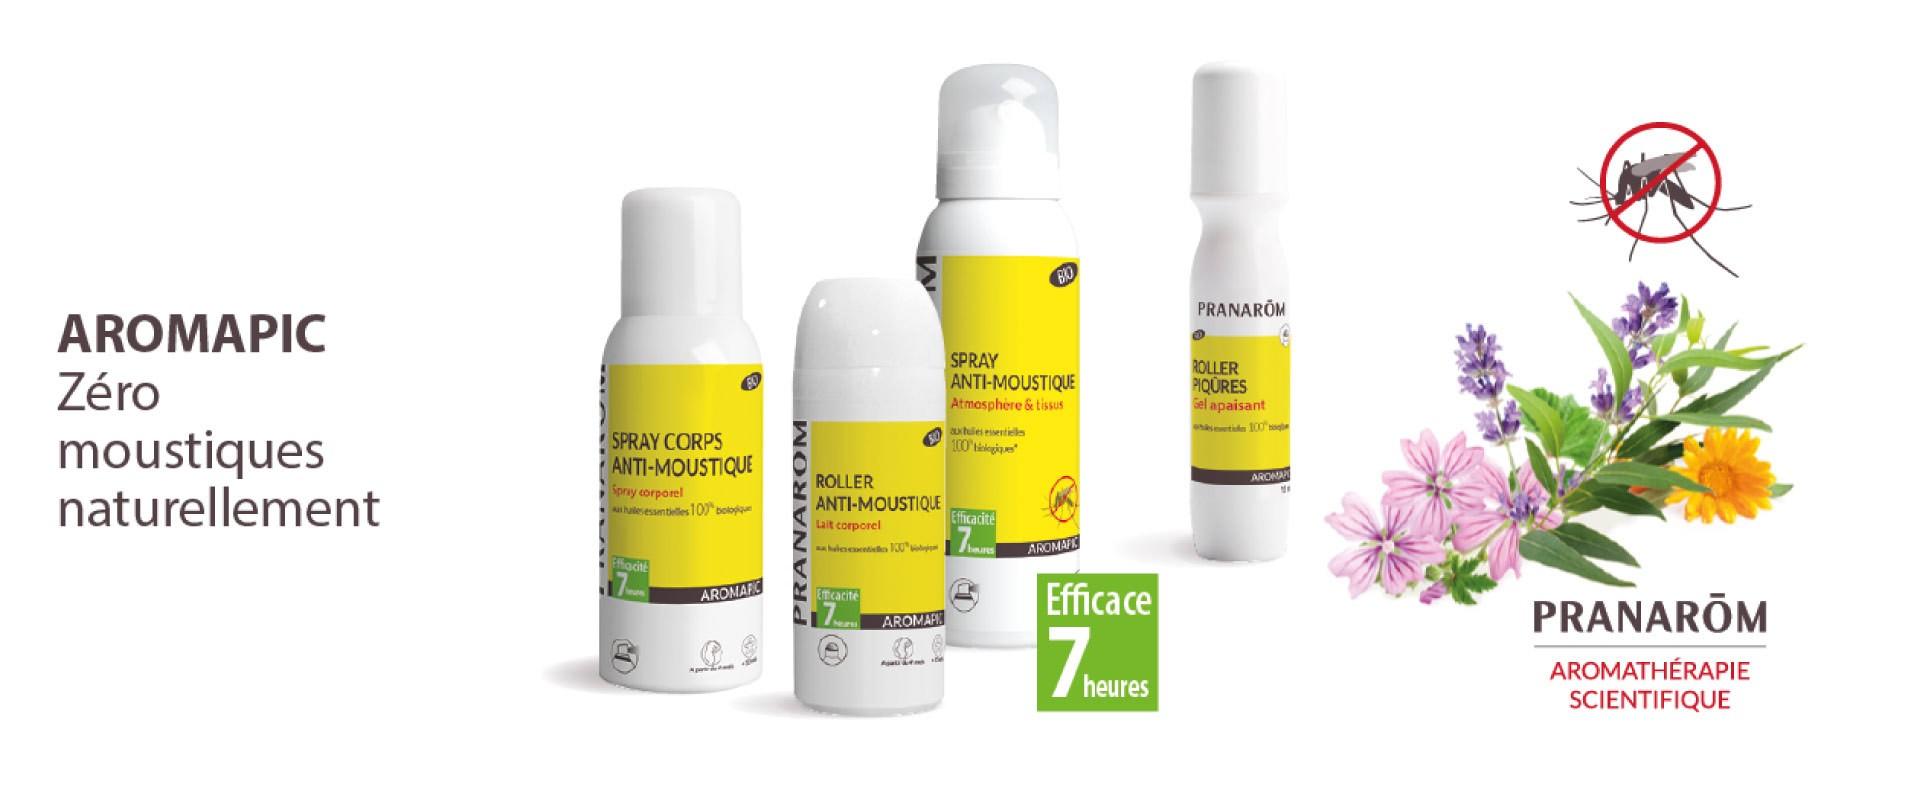 huiles-essentielles-pranarom-Marconne-hesdin-Marconnelle-pharmacie-de-avenue